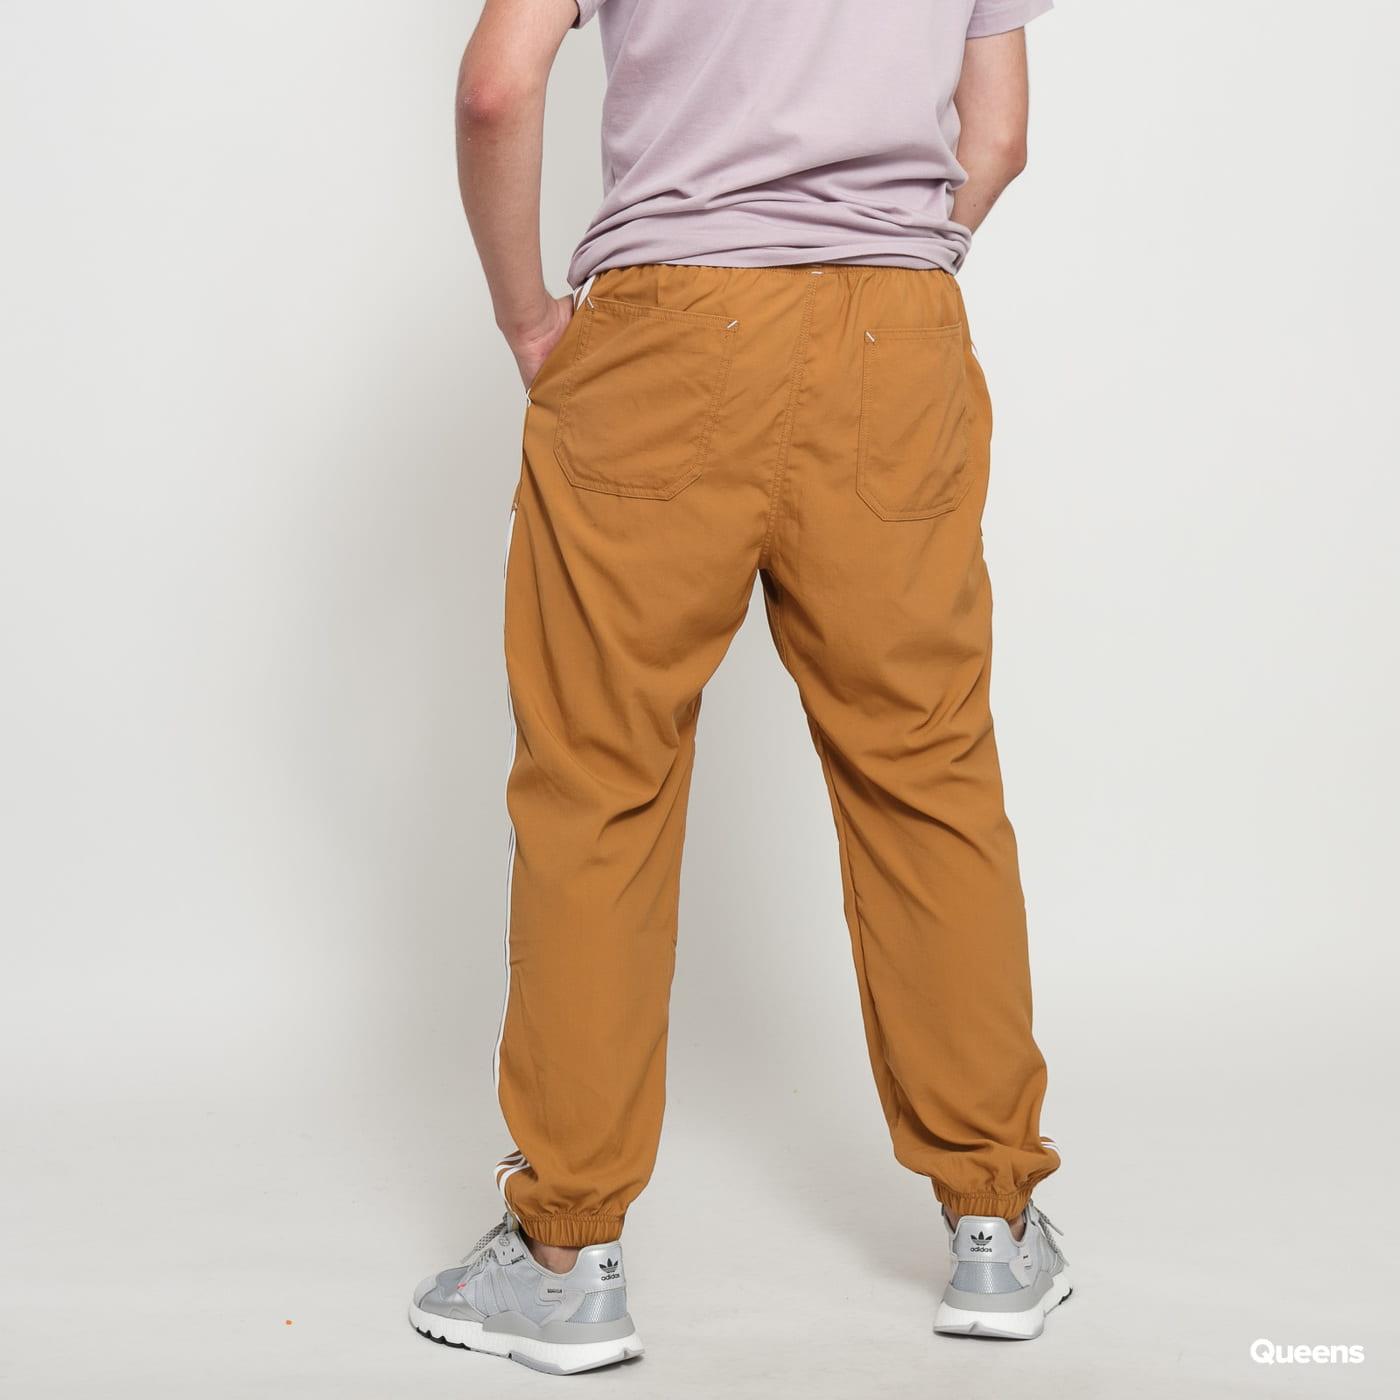 adidas pantalon asw workwear